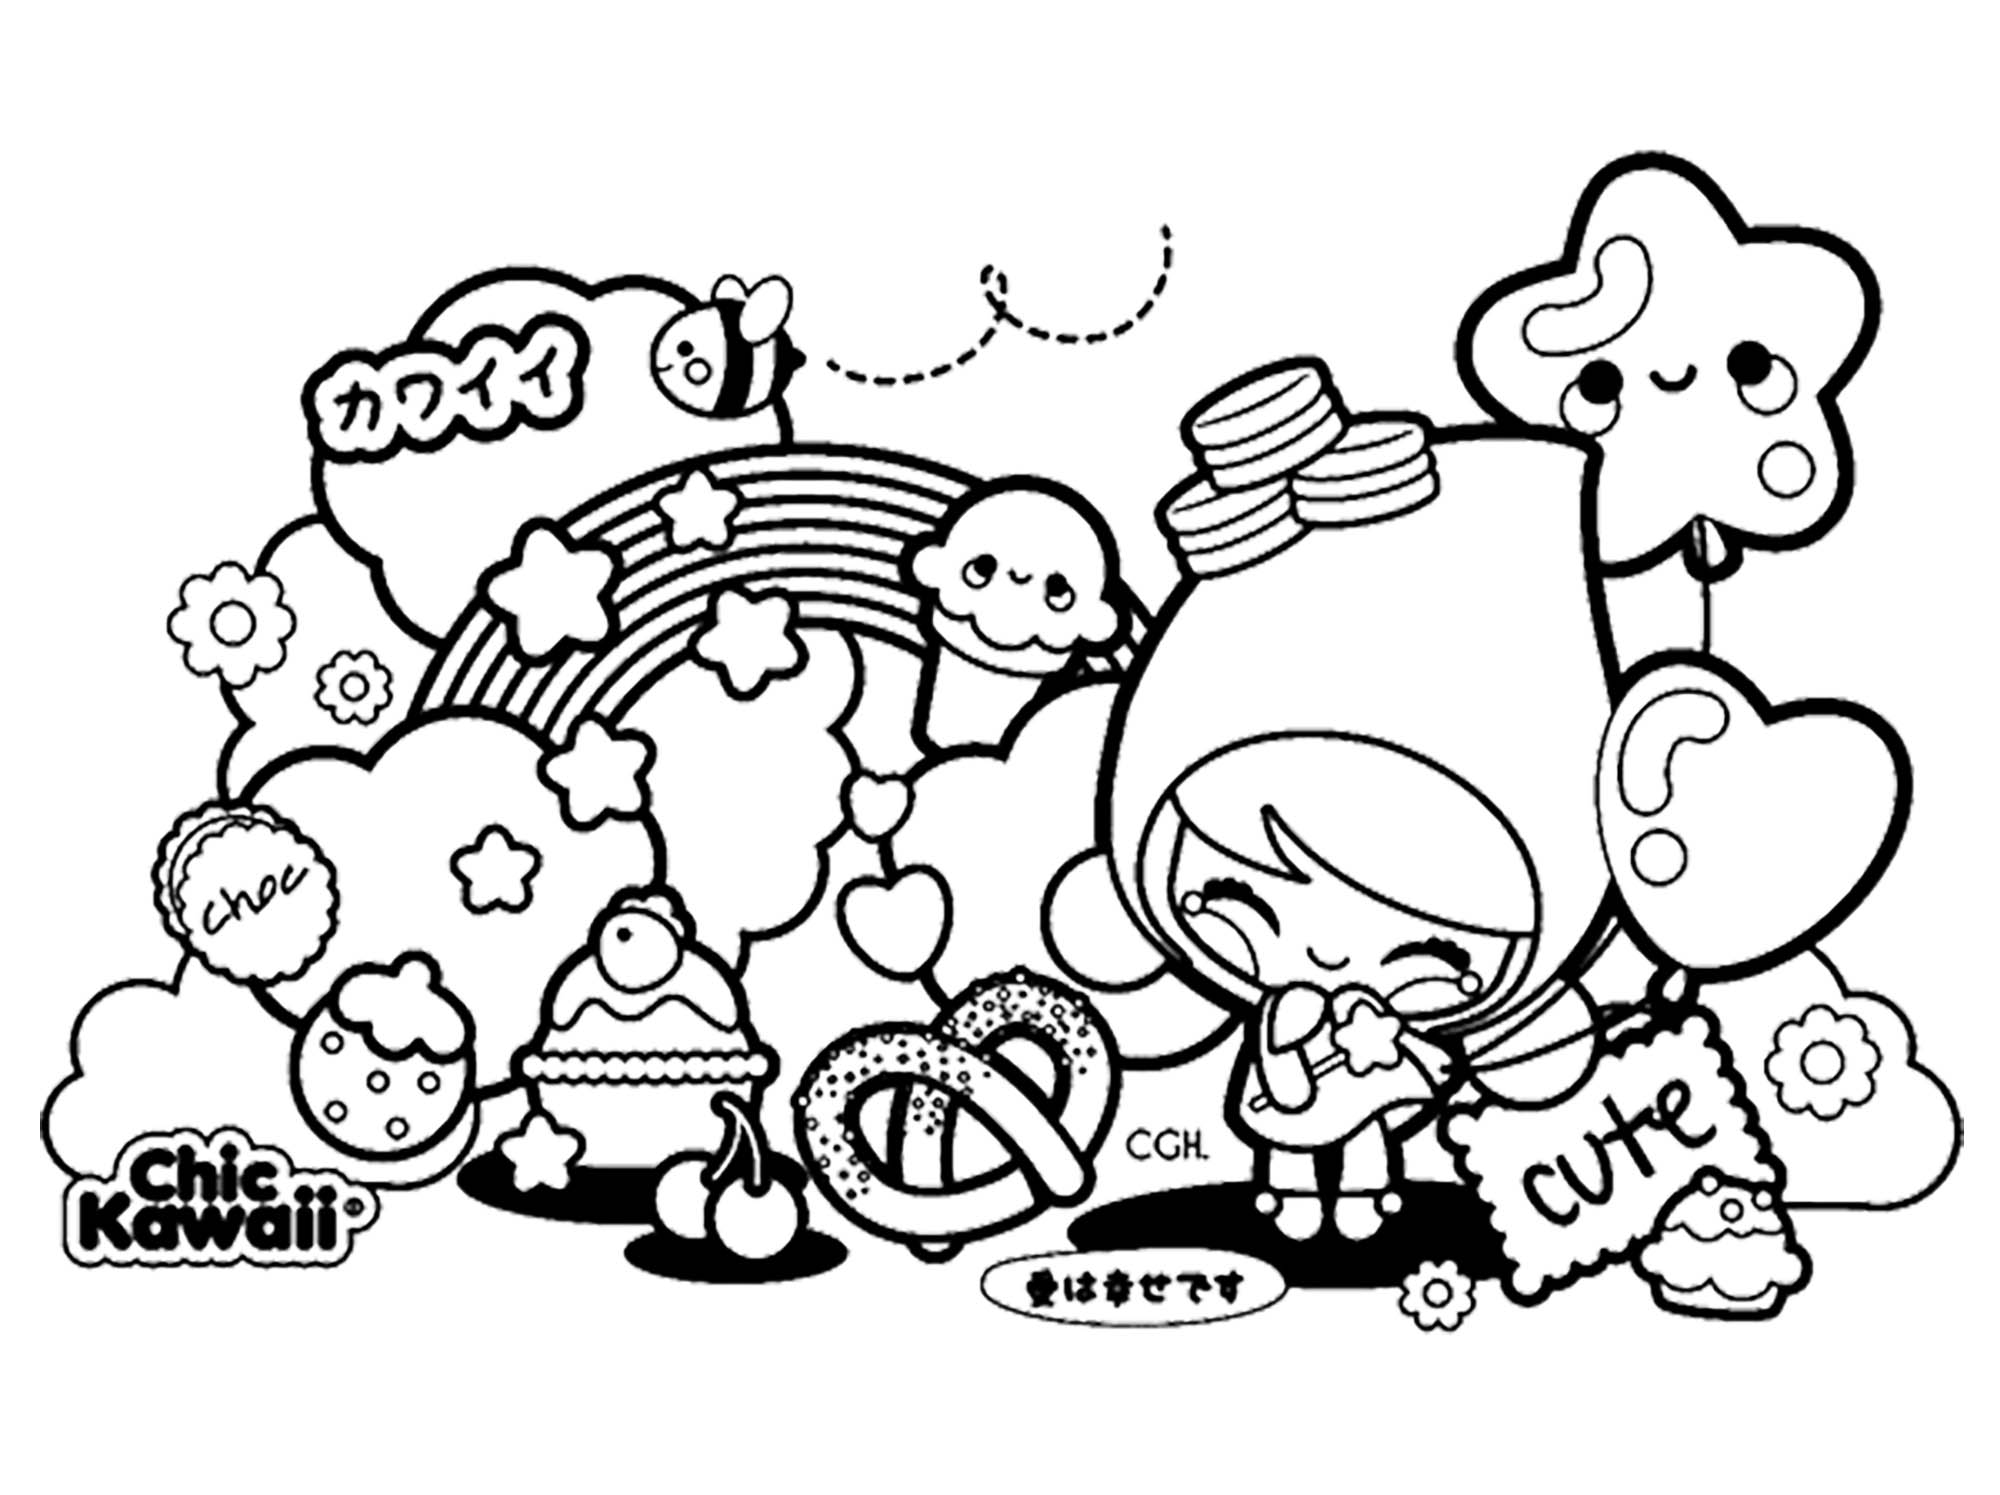 Mangas 43182 - Mangas - Colorear para Adultos